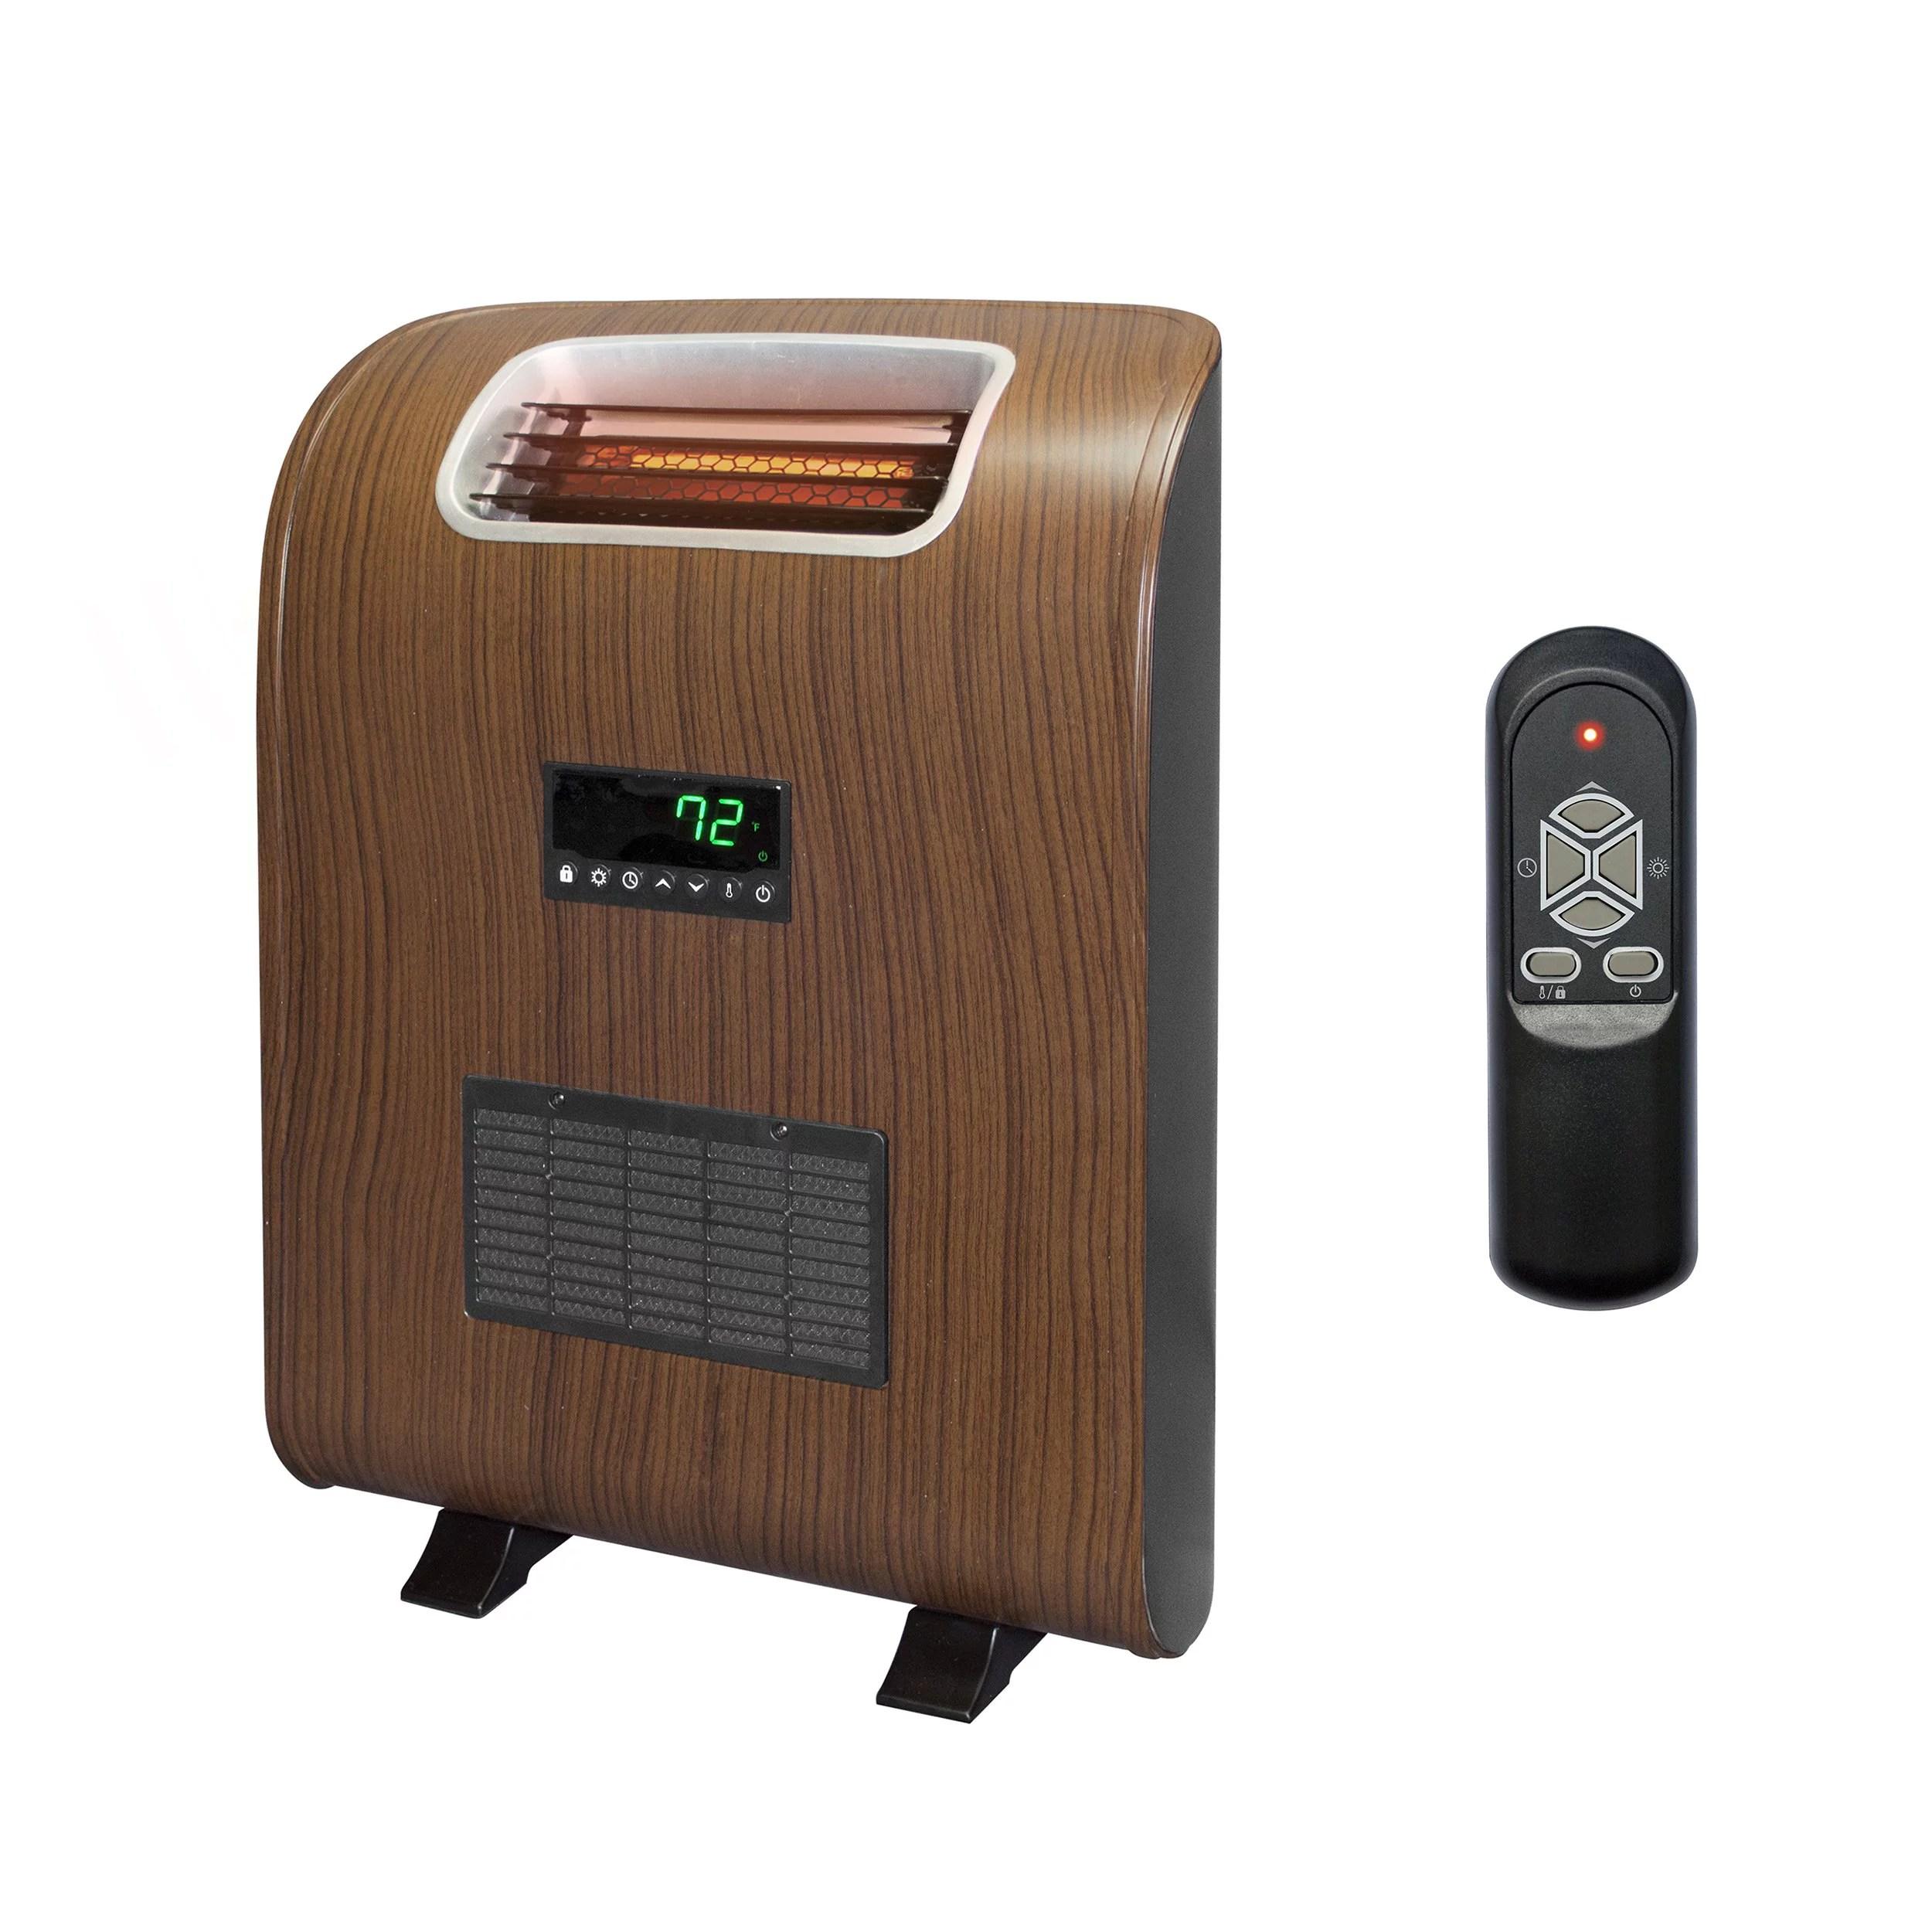 hight resolution of lifesmart 1500 watt slim compact portable infrared quartz electric lifesmart ls 1000 infrared heater wiring diagram